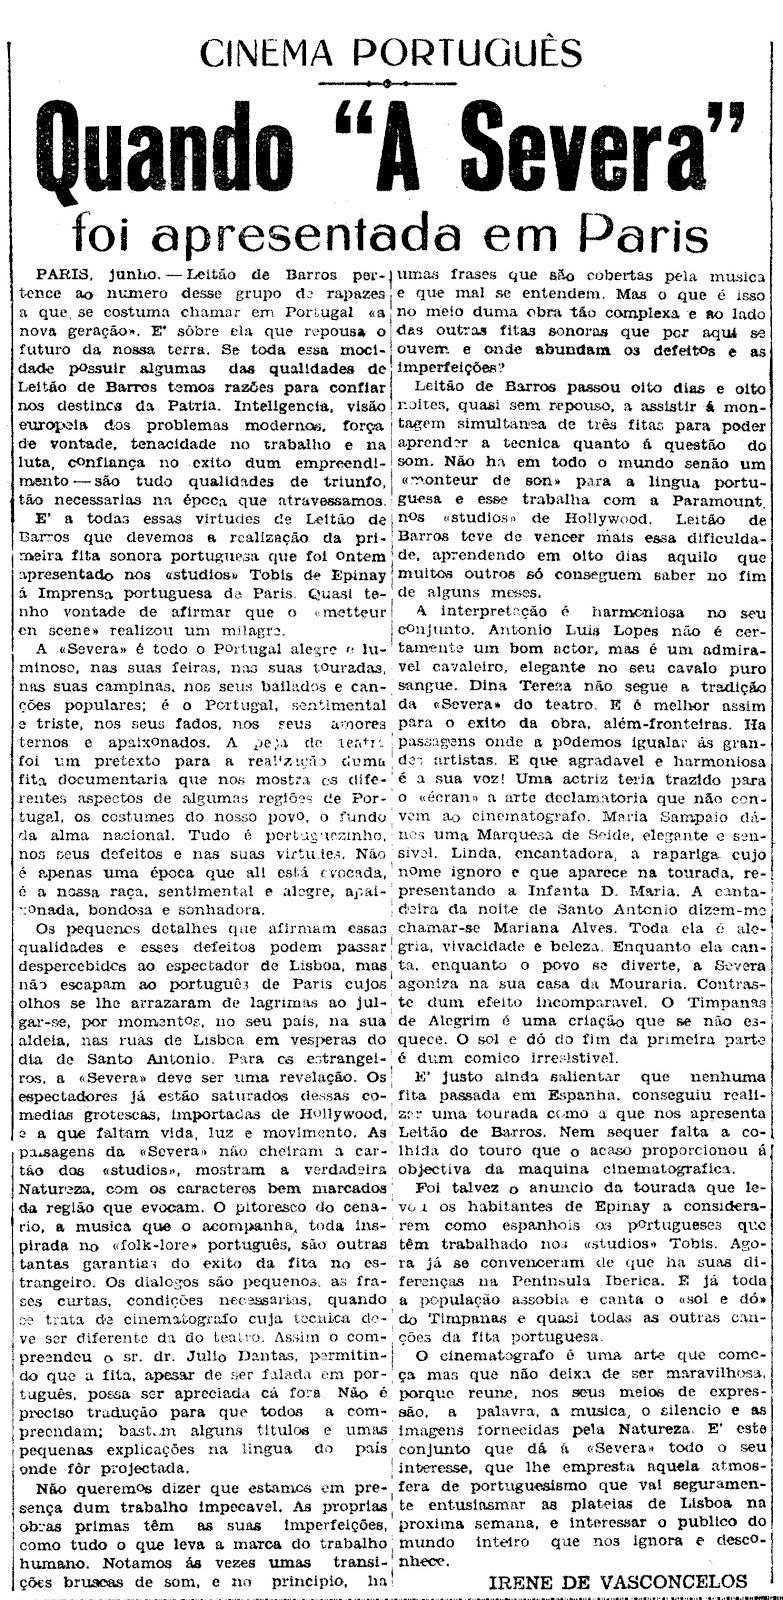 [1931-A-Severa-17-065]